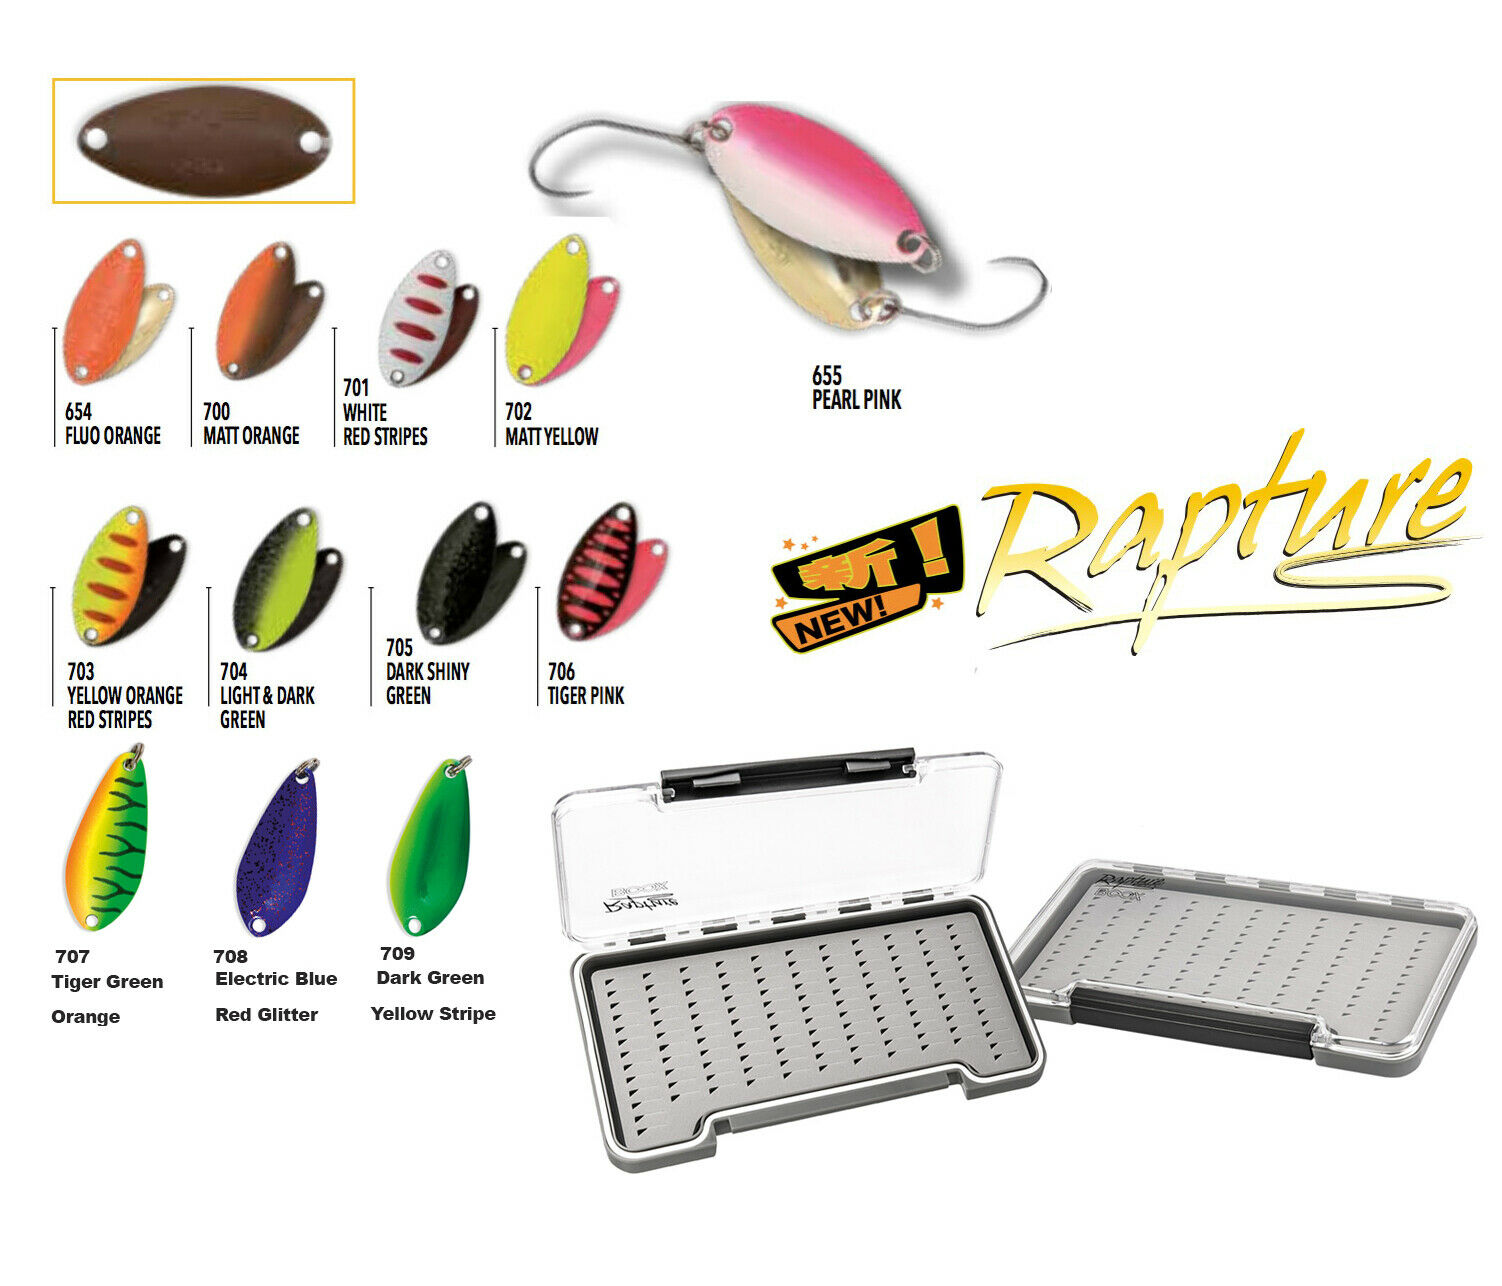 KP3717 Spoon japan pesca Trout Area Isei Sue 2,3 gr + Scatolina Rapture     RNR